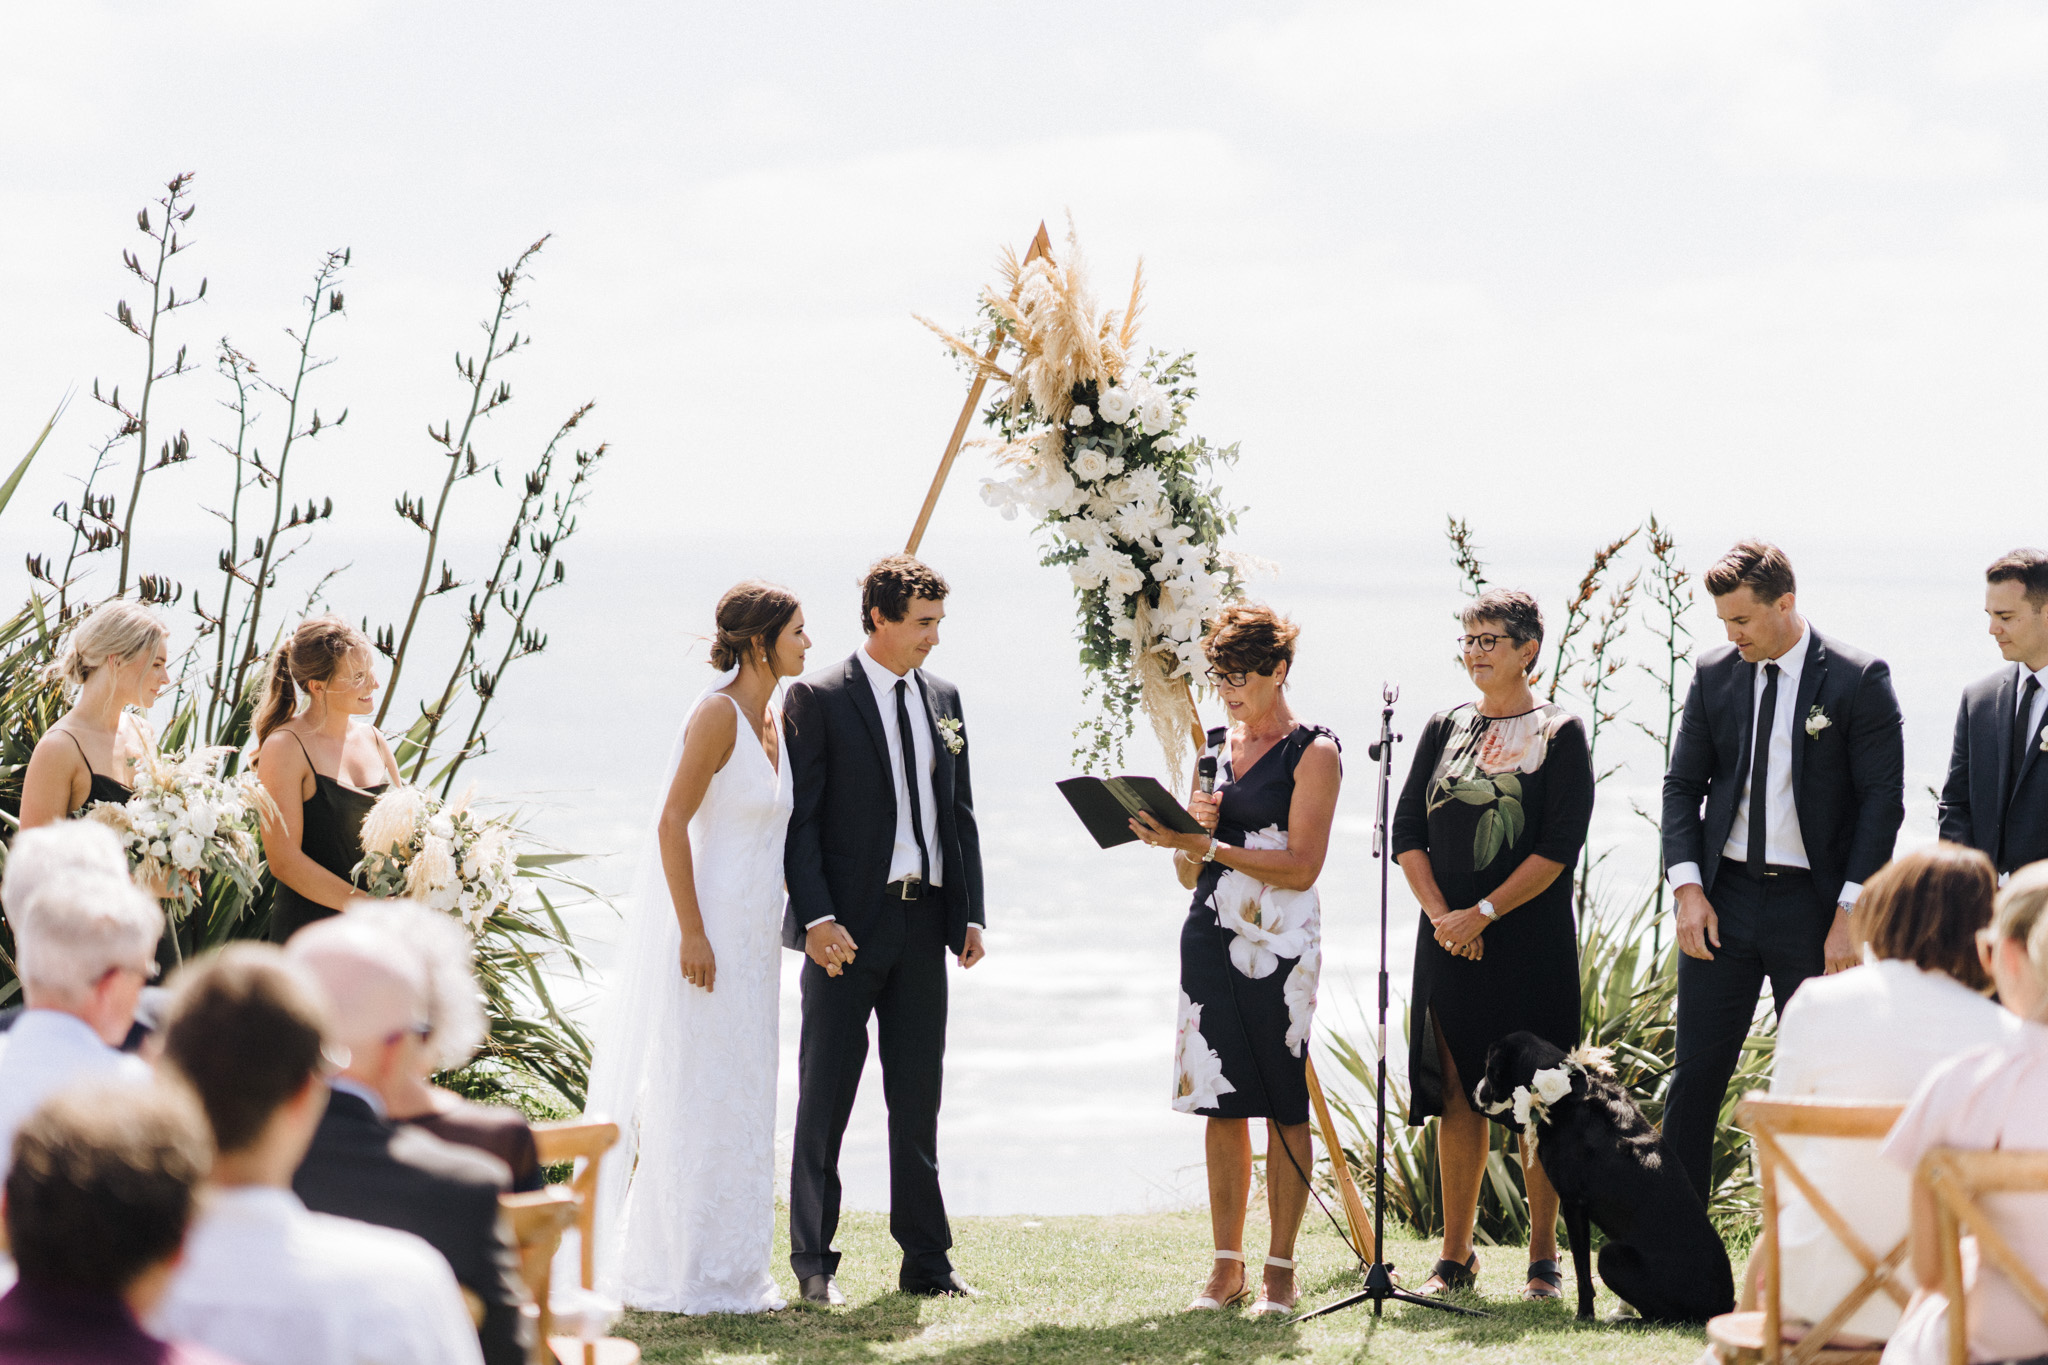 newfound-h-m-castaways-waiuku-auckland-wedding-photographer-115